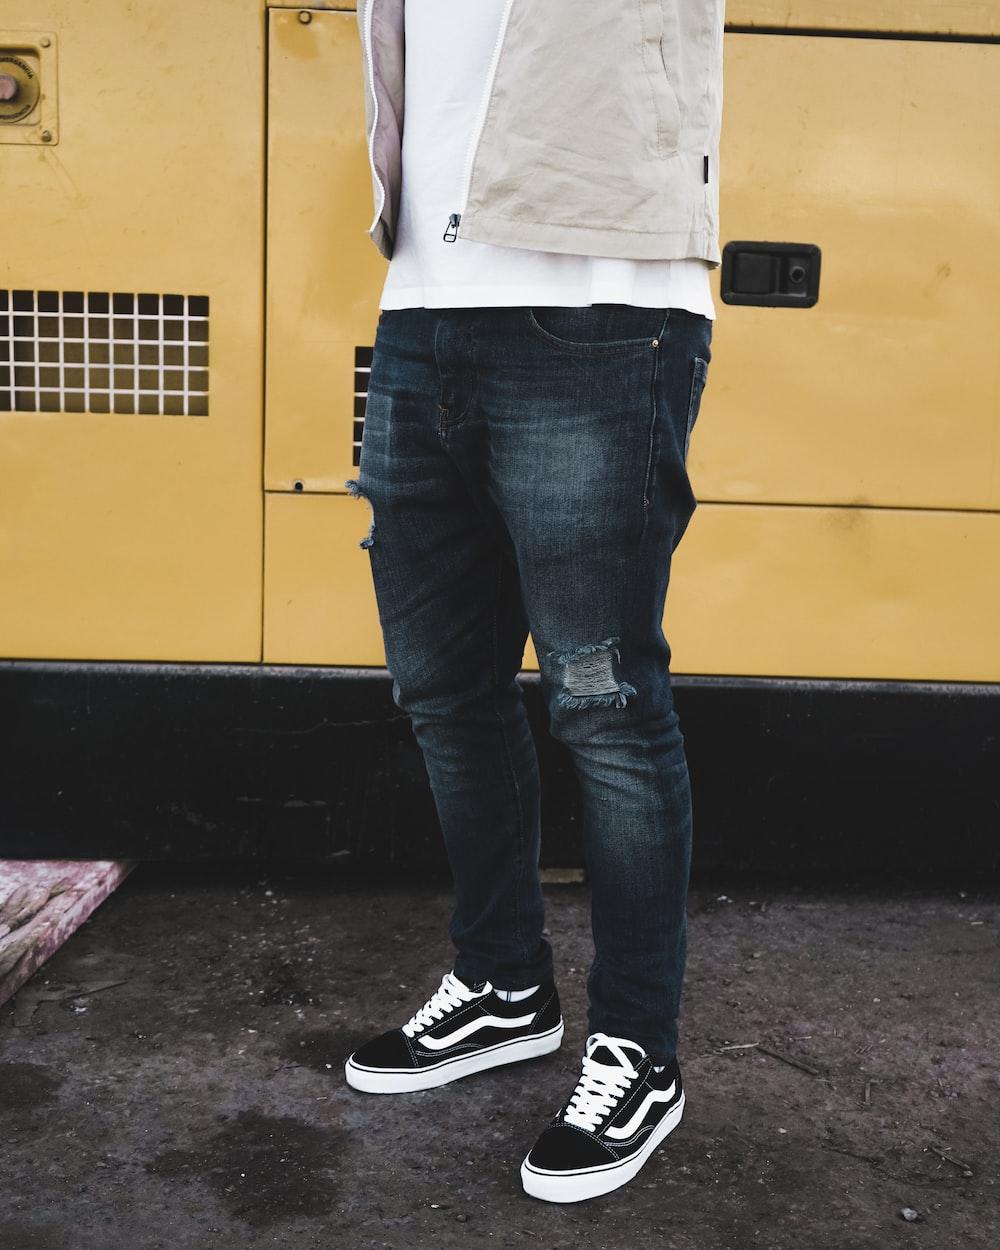 man wearing distressed black denim fitted jeans and pair of black Vans Old Skool shoes